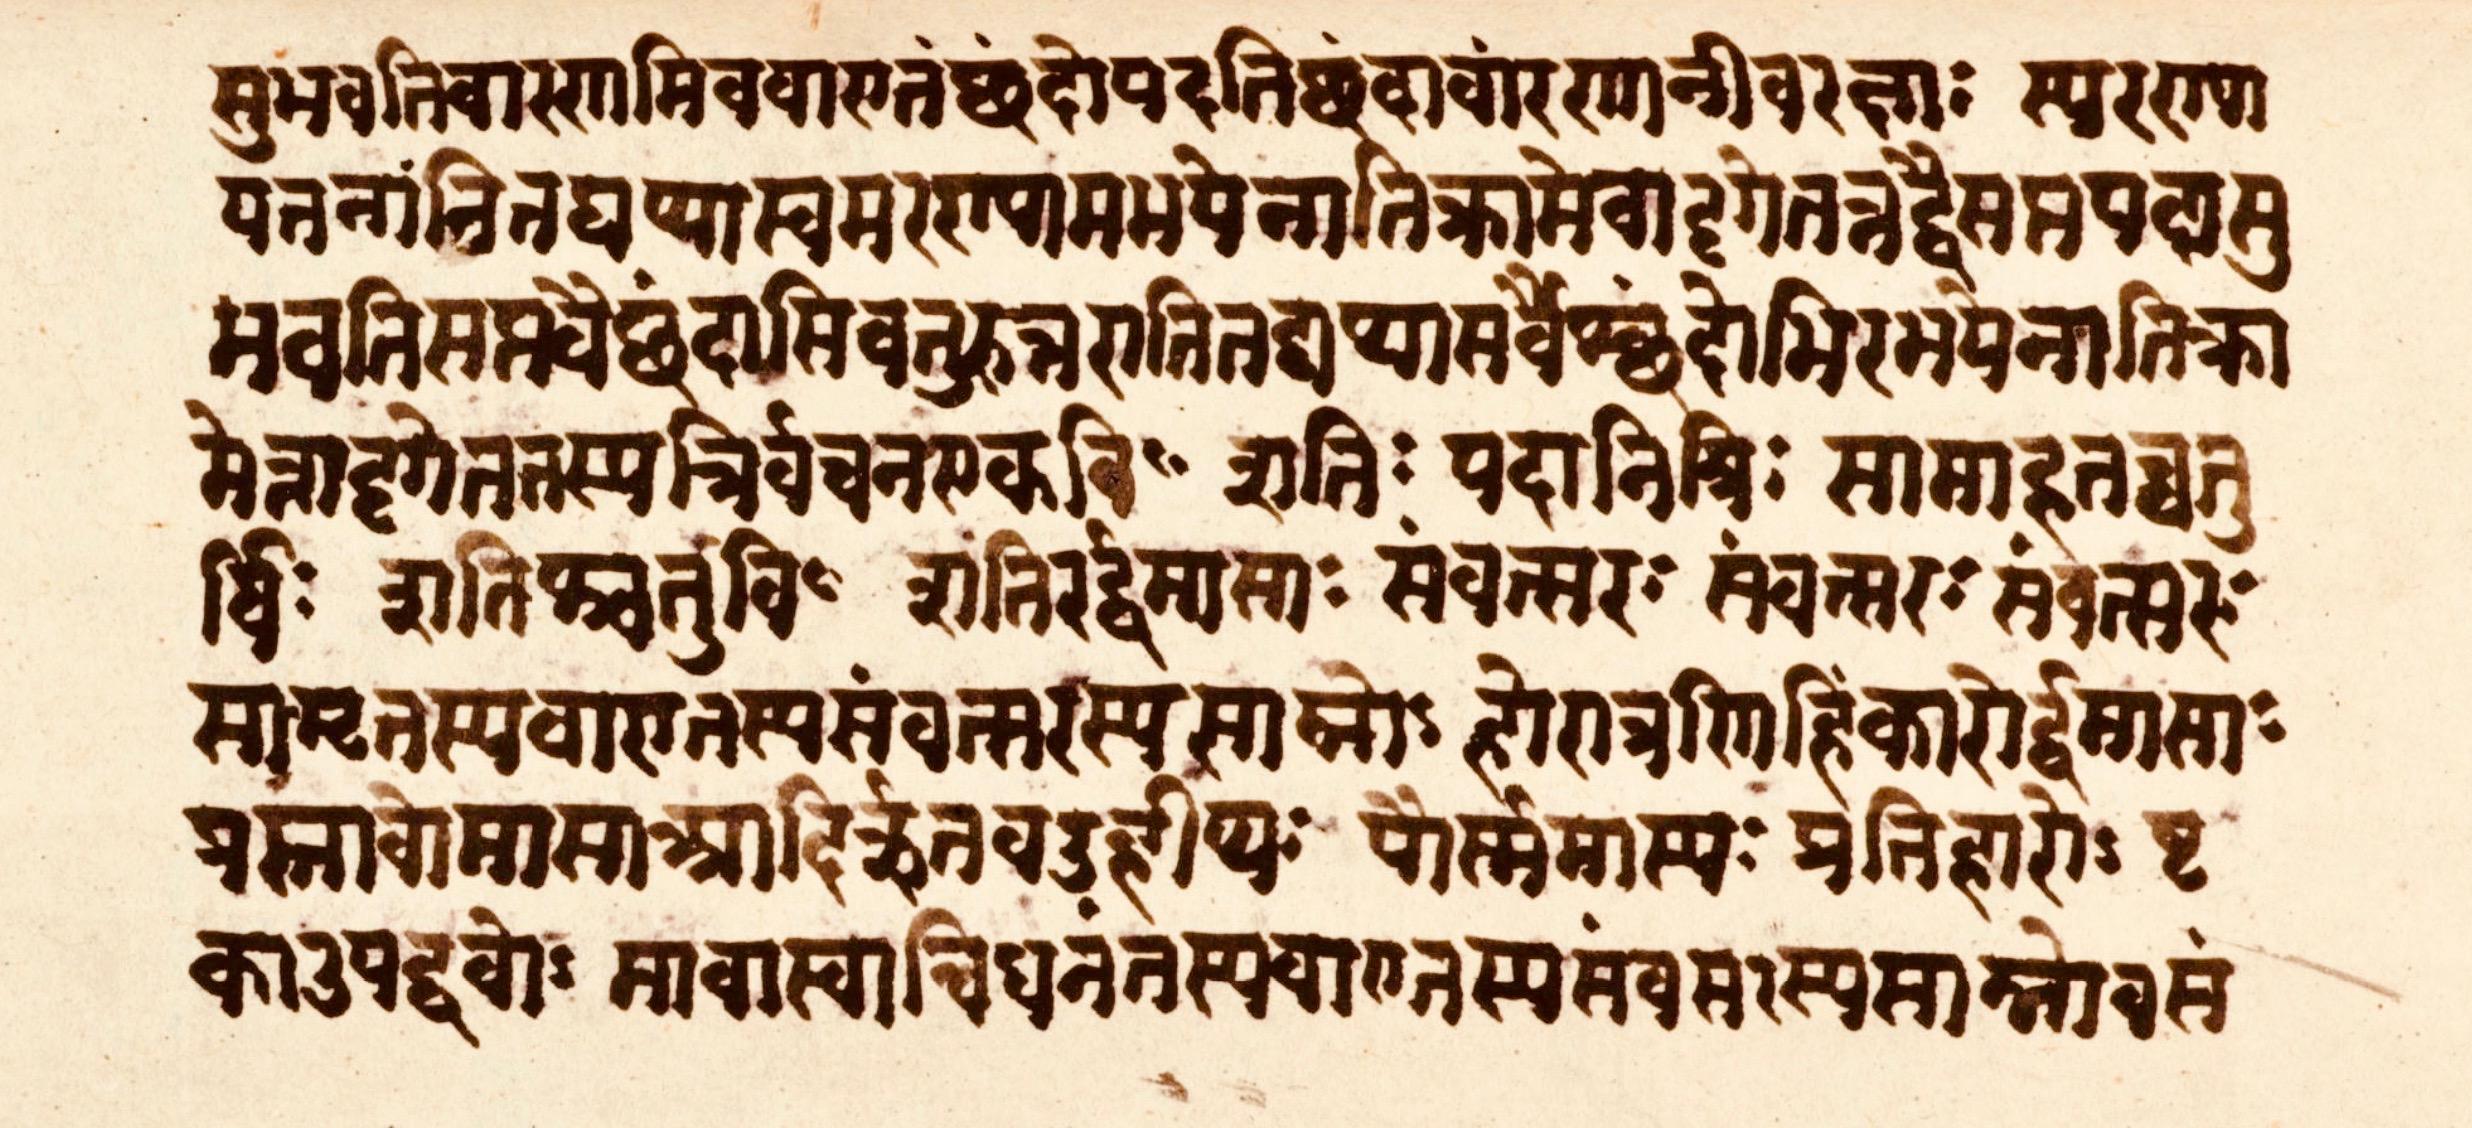 Samaveda - Wikipedia